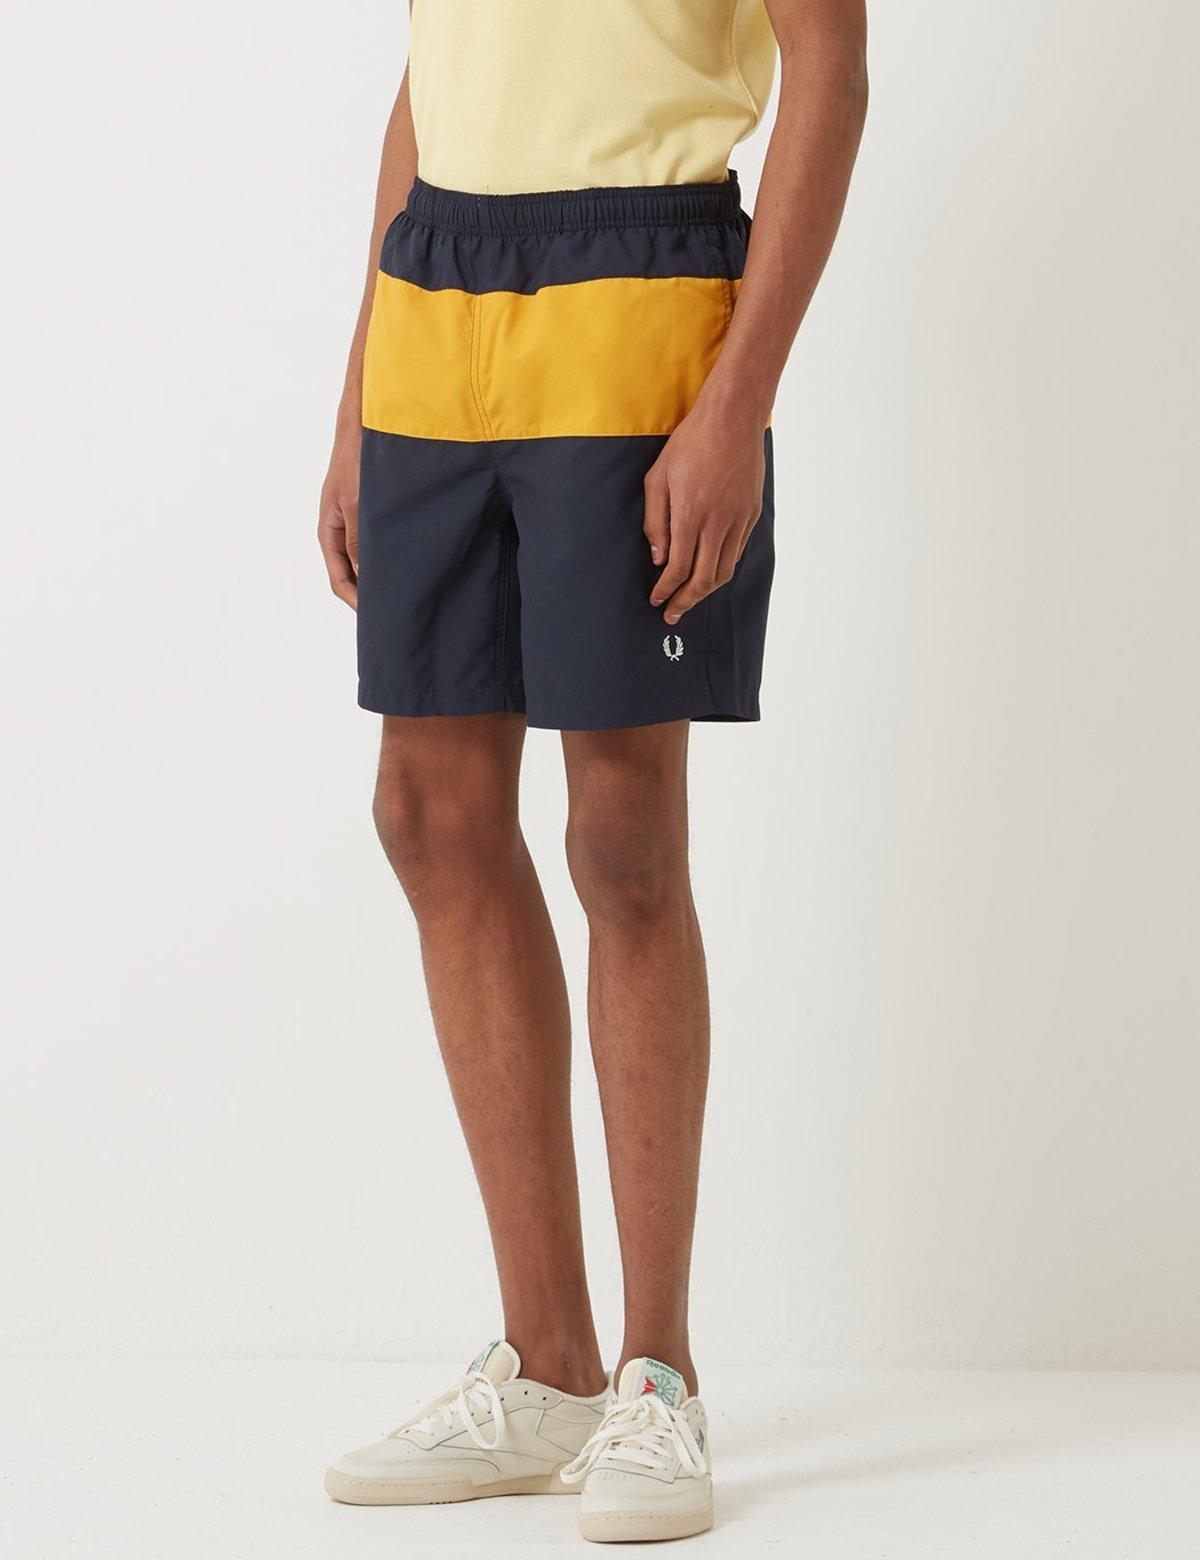 343d75149c Fred Perry Panelled Swim Short - Navy | Garmentory